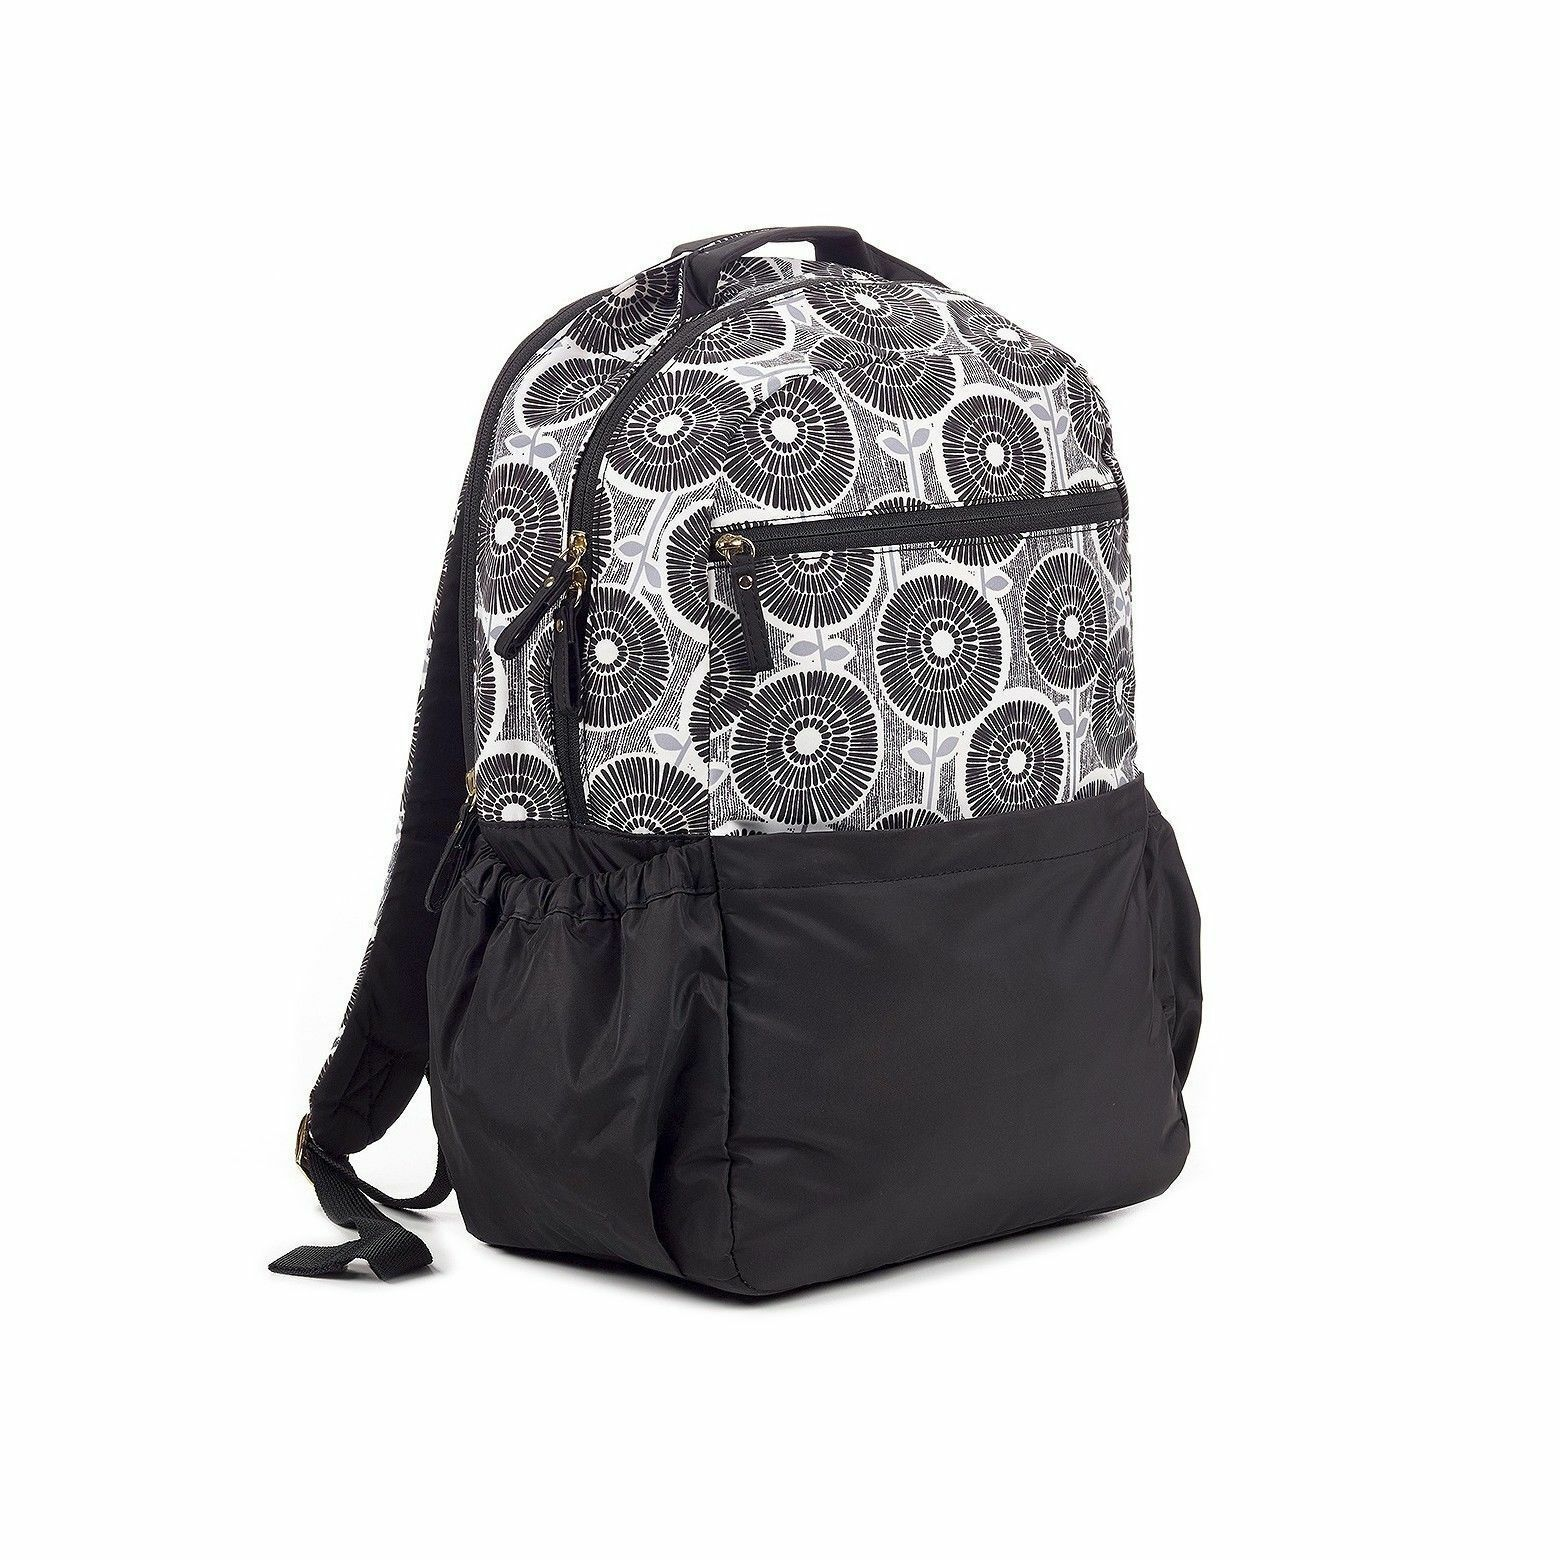 Brand New Studio C Hello Dahlia Black & White Floral Backpack 51251292